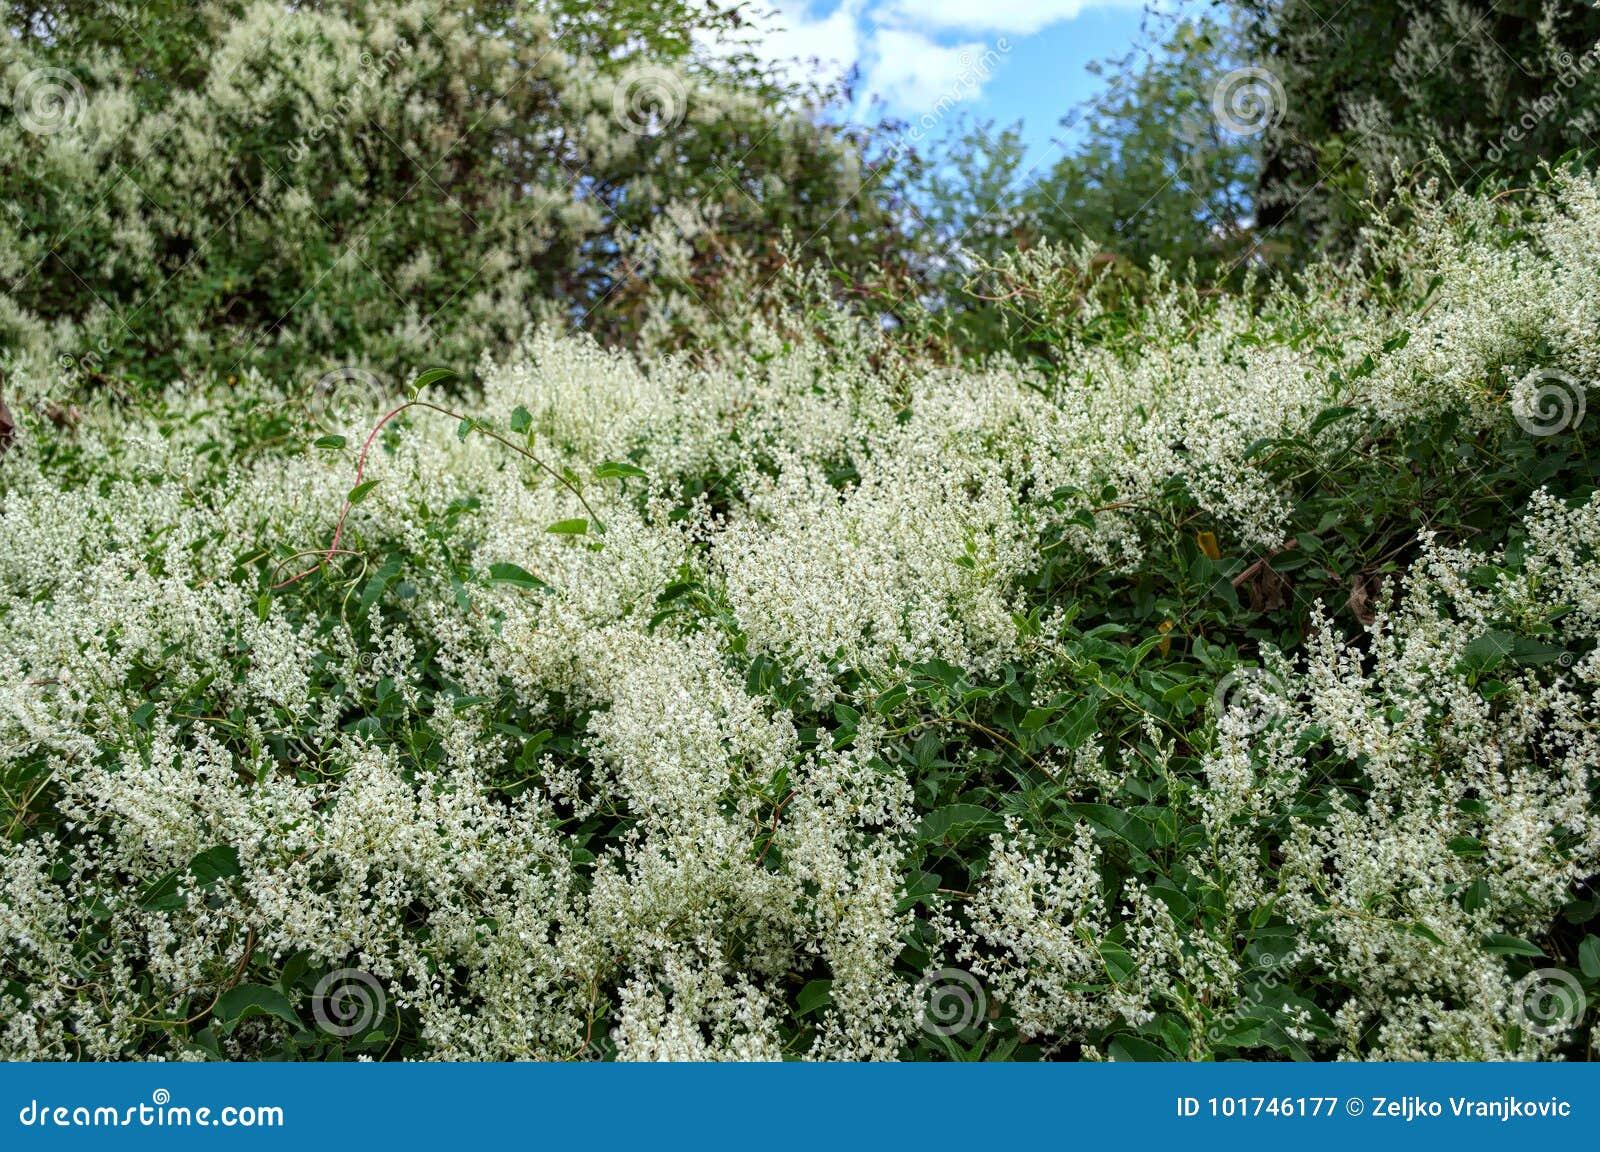 Piante Rampicanti Fiori Bianchi.Climbing Plant Abundance Of Blooming White Flowers Stock Image